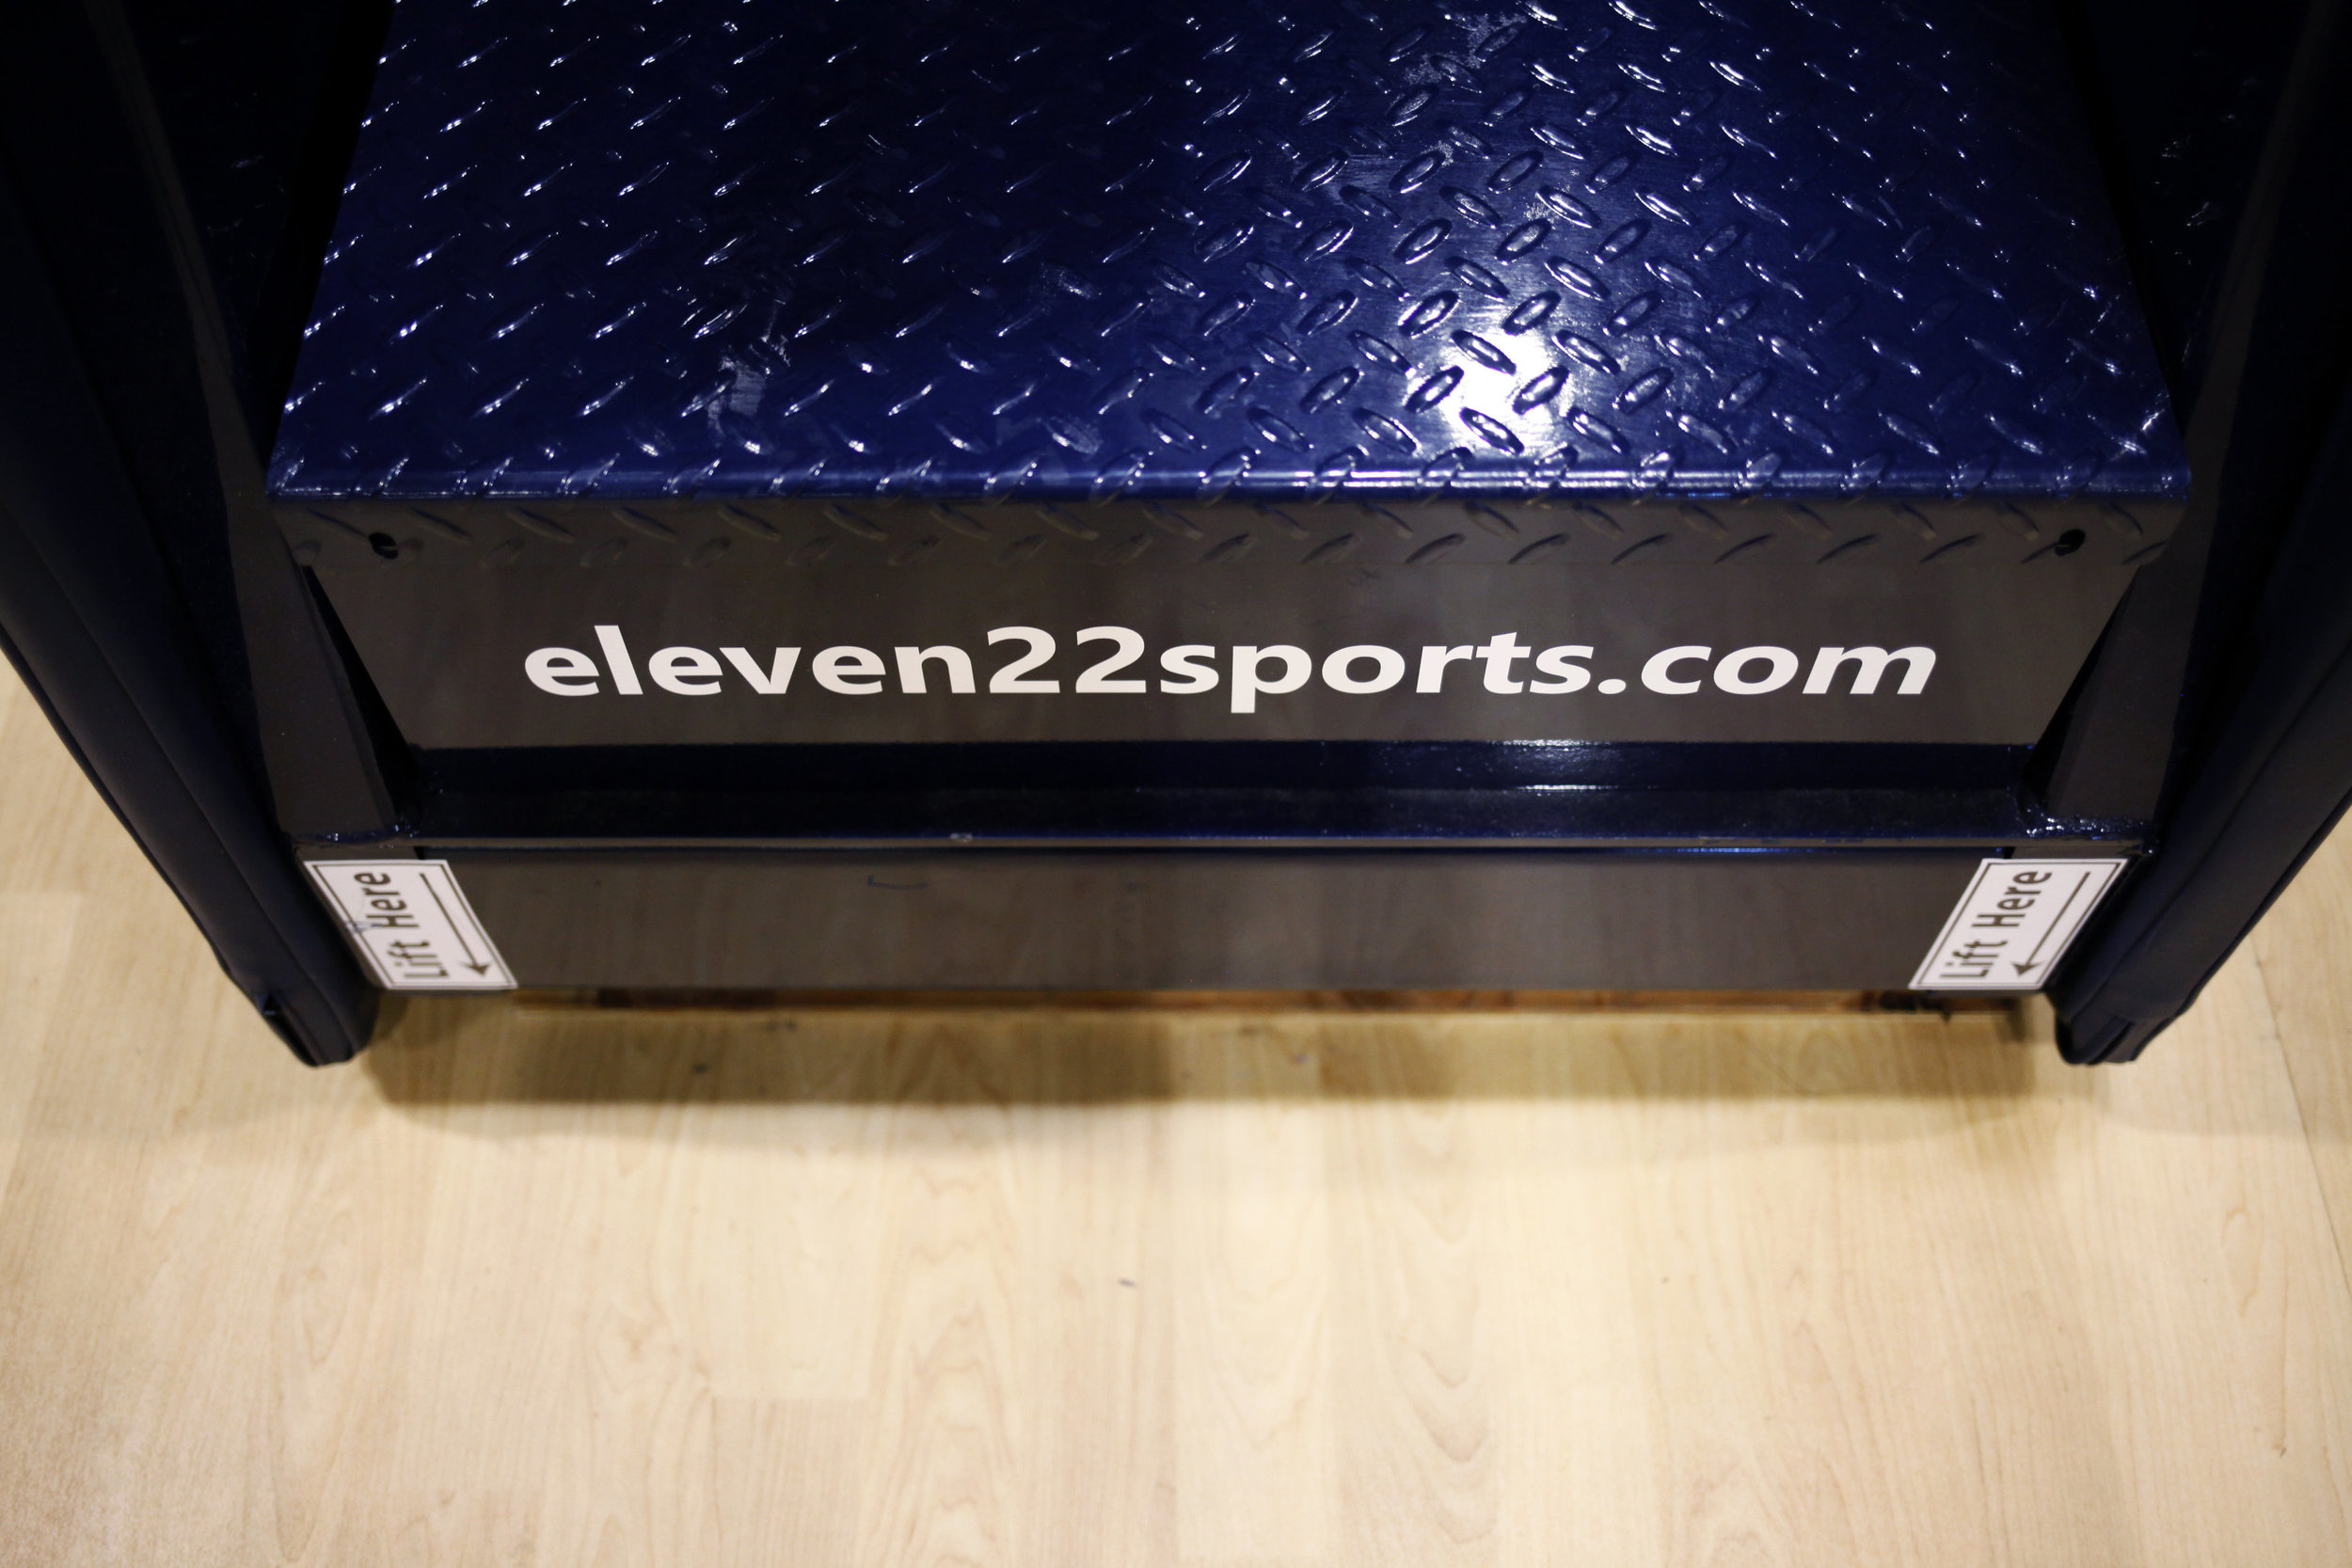 Eleven22-Eleven22-0011.jpg